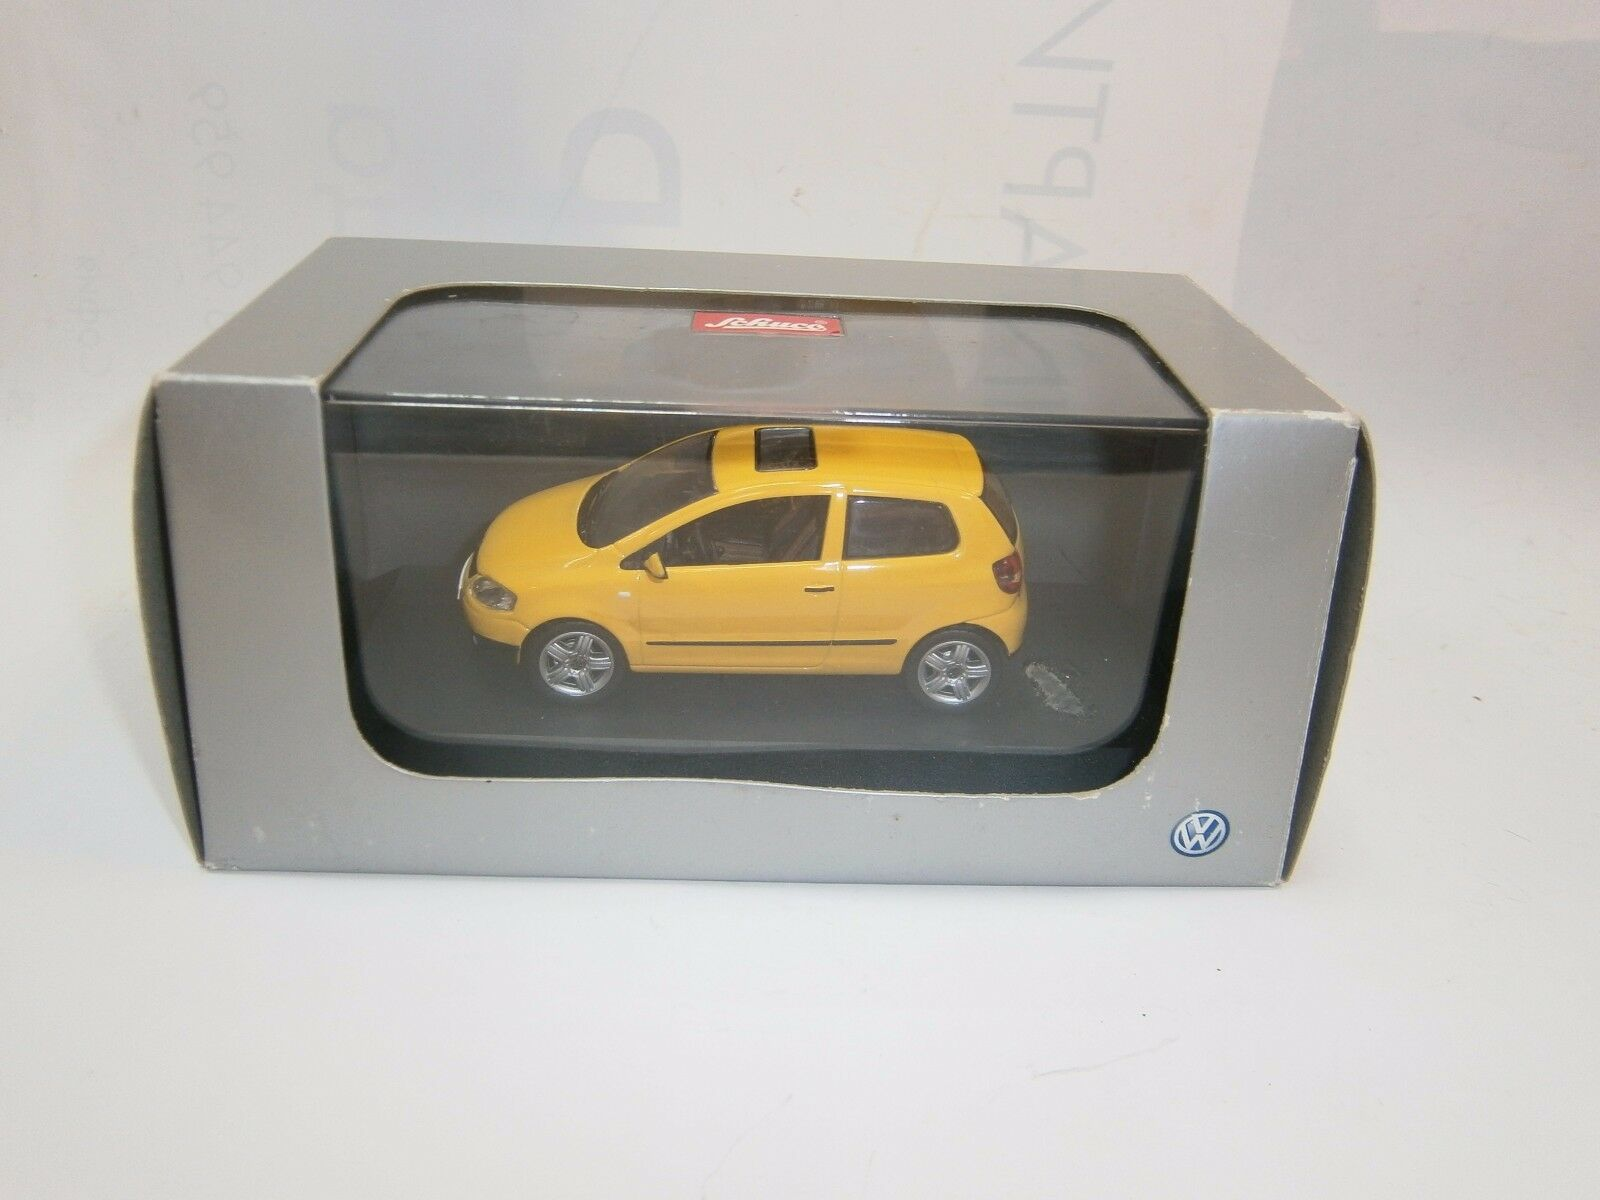 N.o.s. Limited Edition Volswagen Fox Schuco 1 43 + Caja